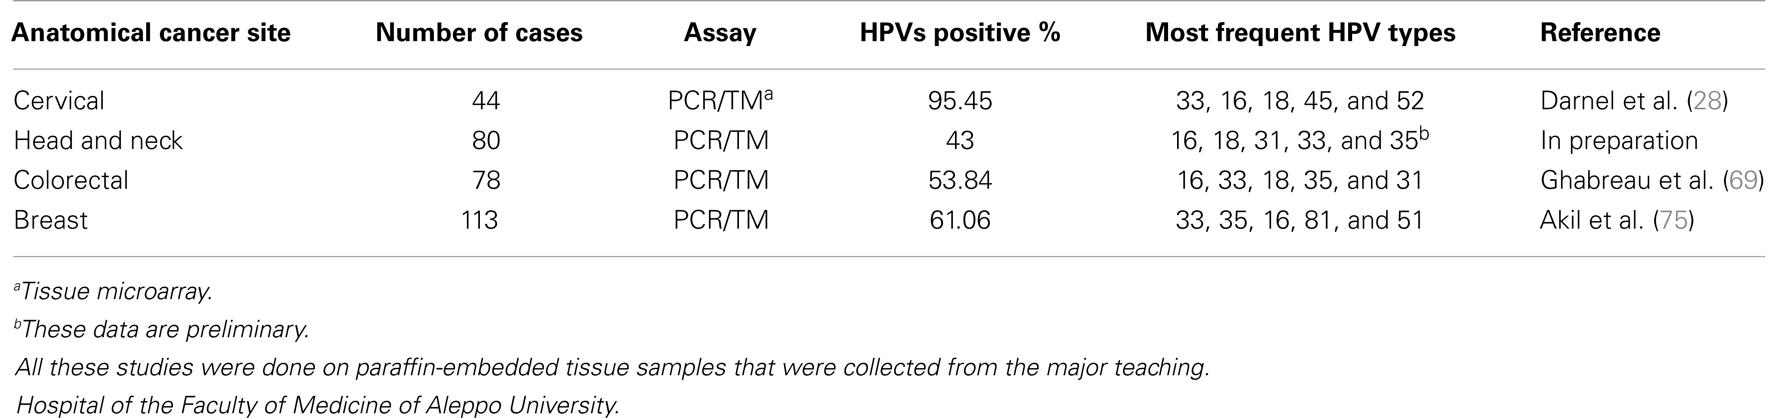 hpv vaccine pris 2018